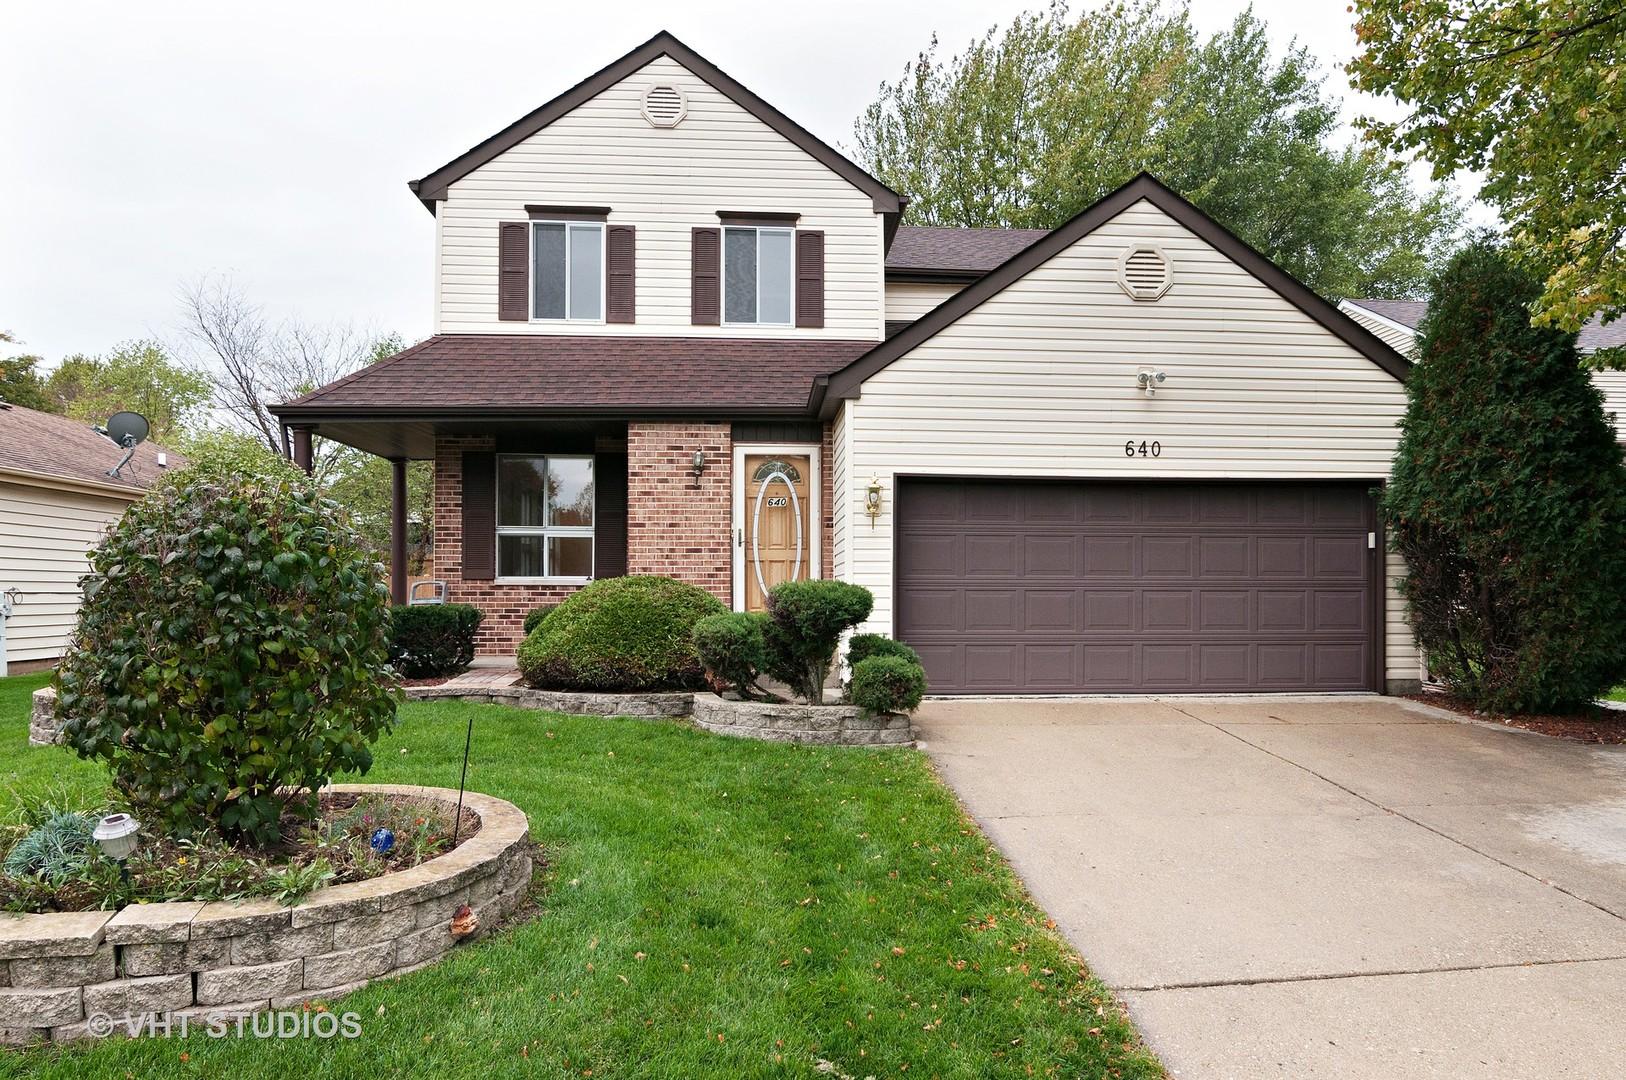 640 Topeka ,Carol Stream, Illinois 60188